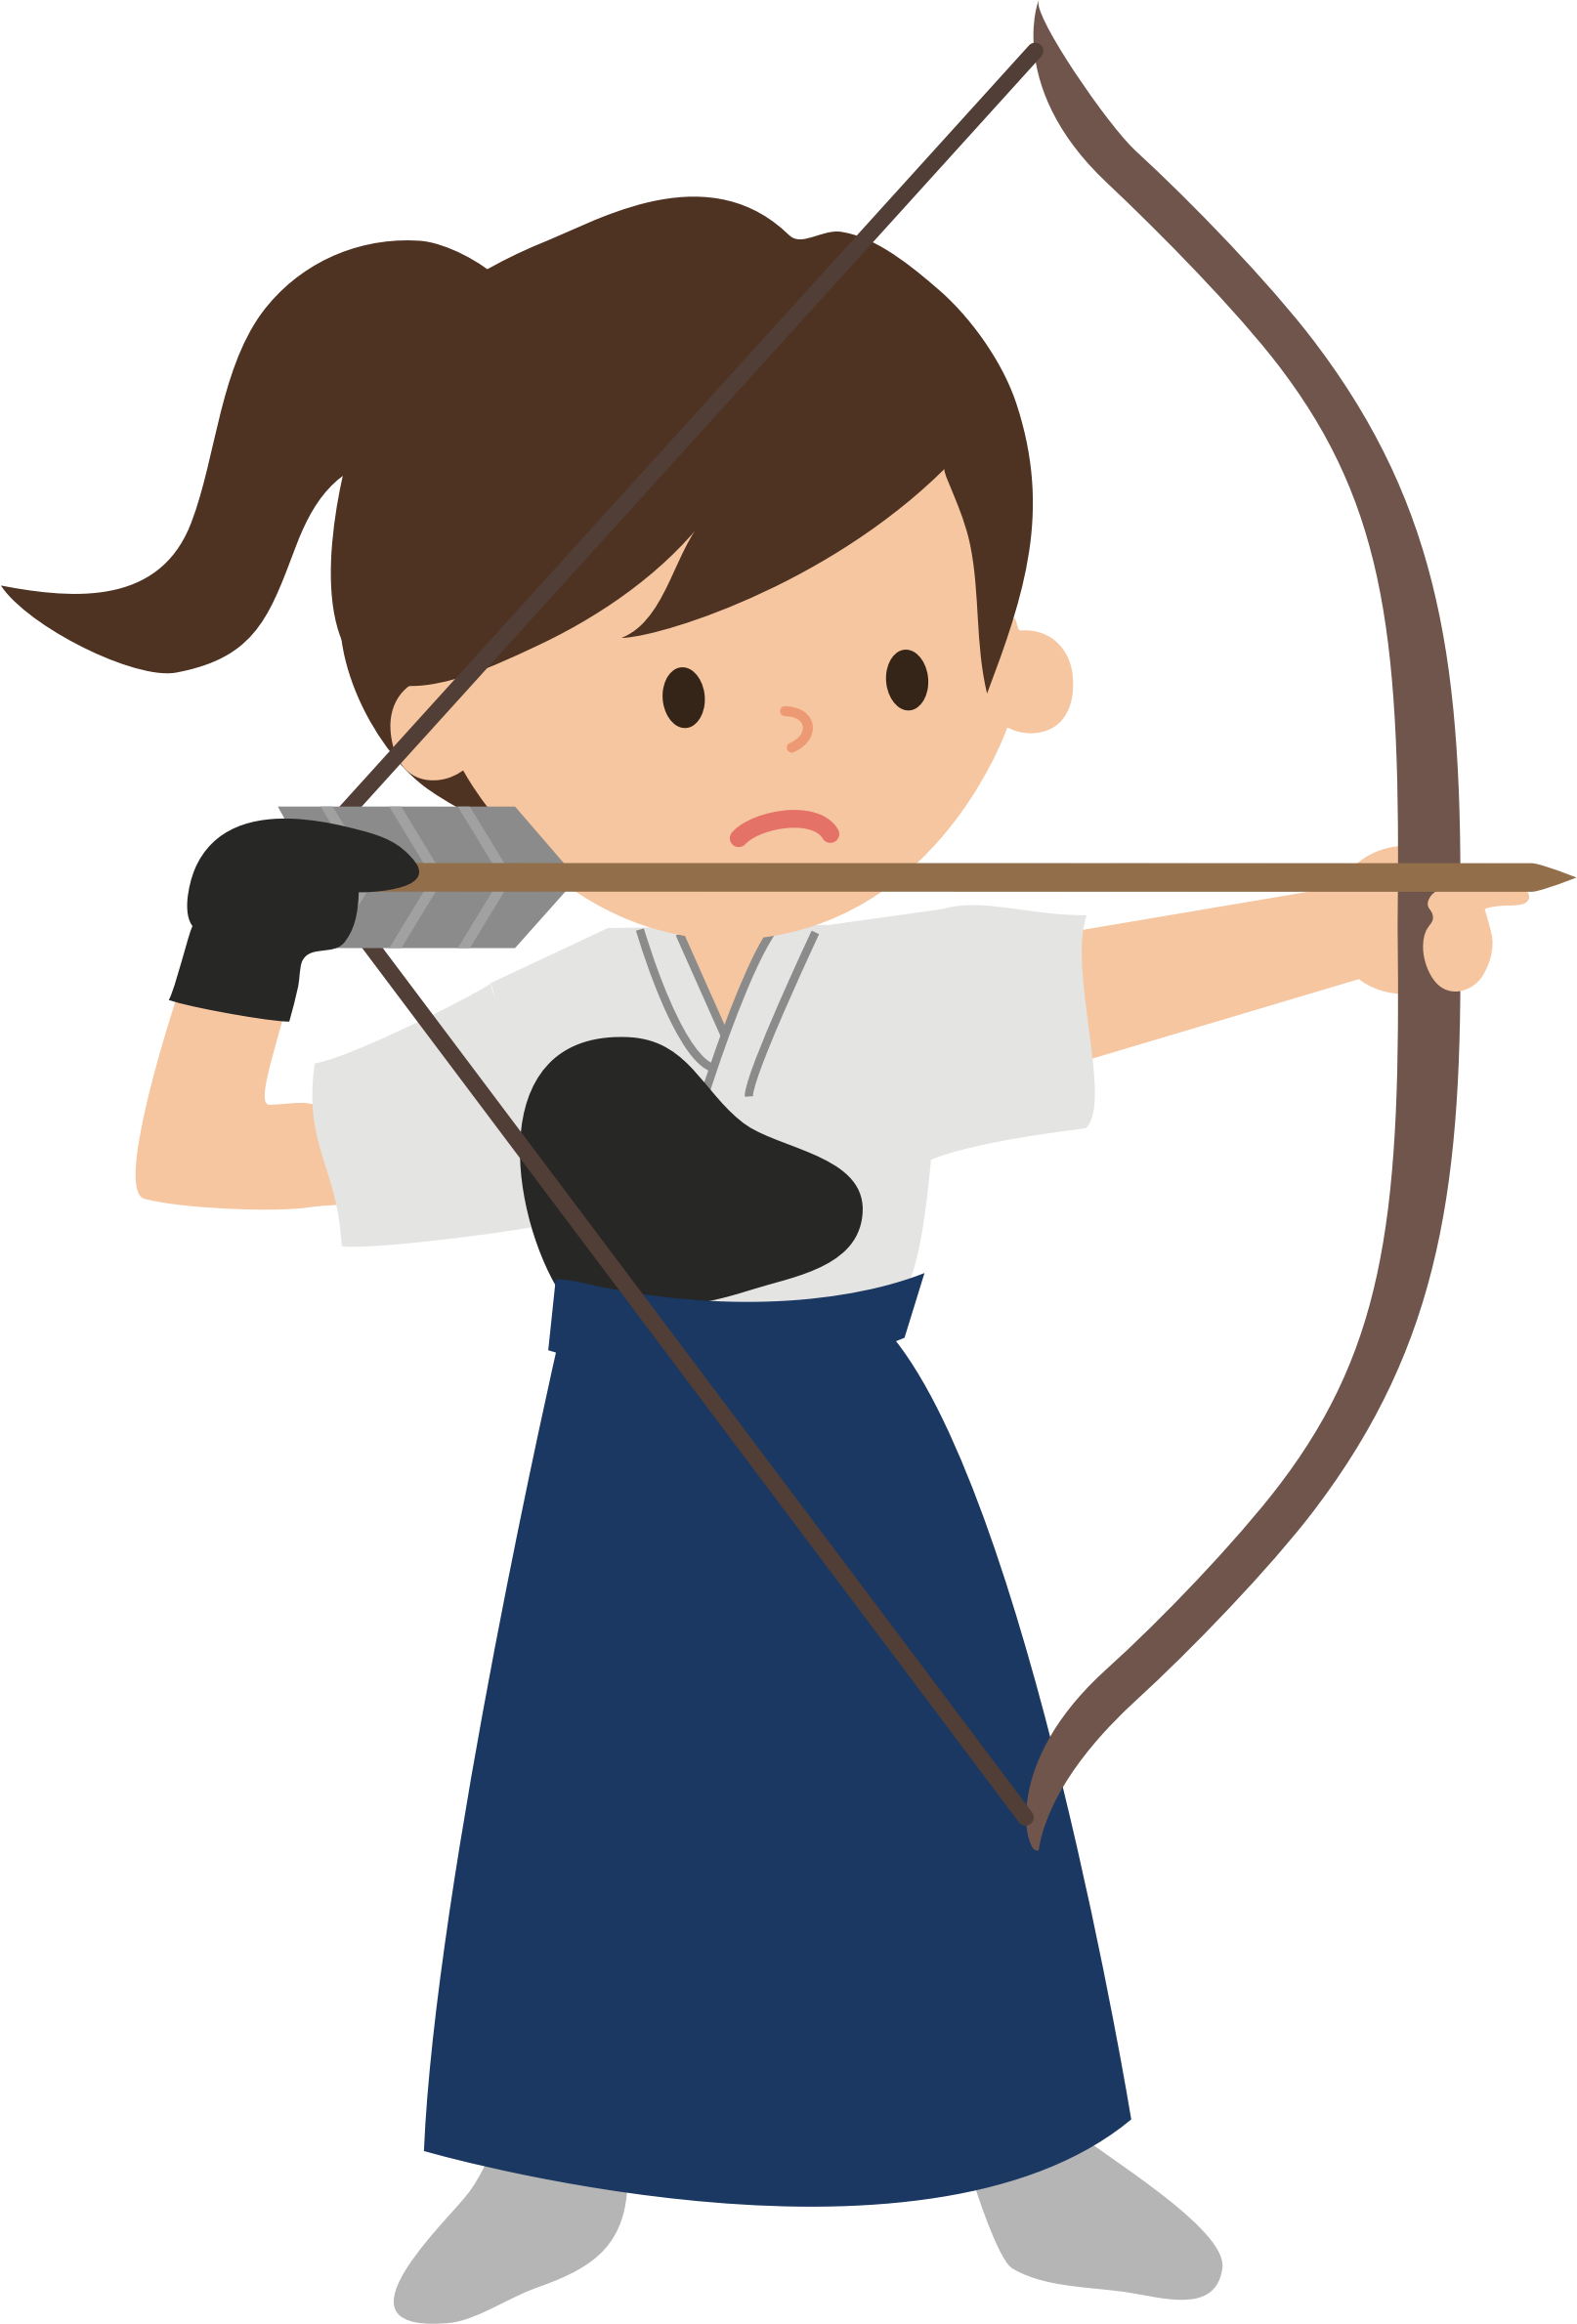 Female archer big image. Girl clipart archery